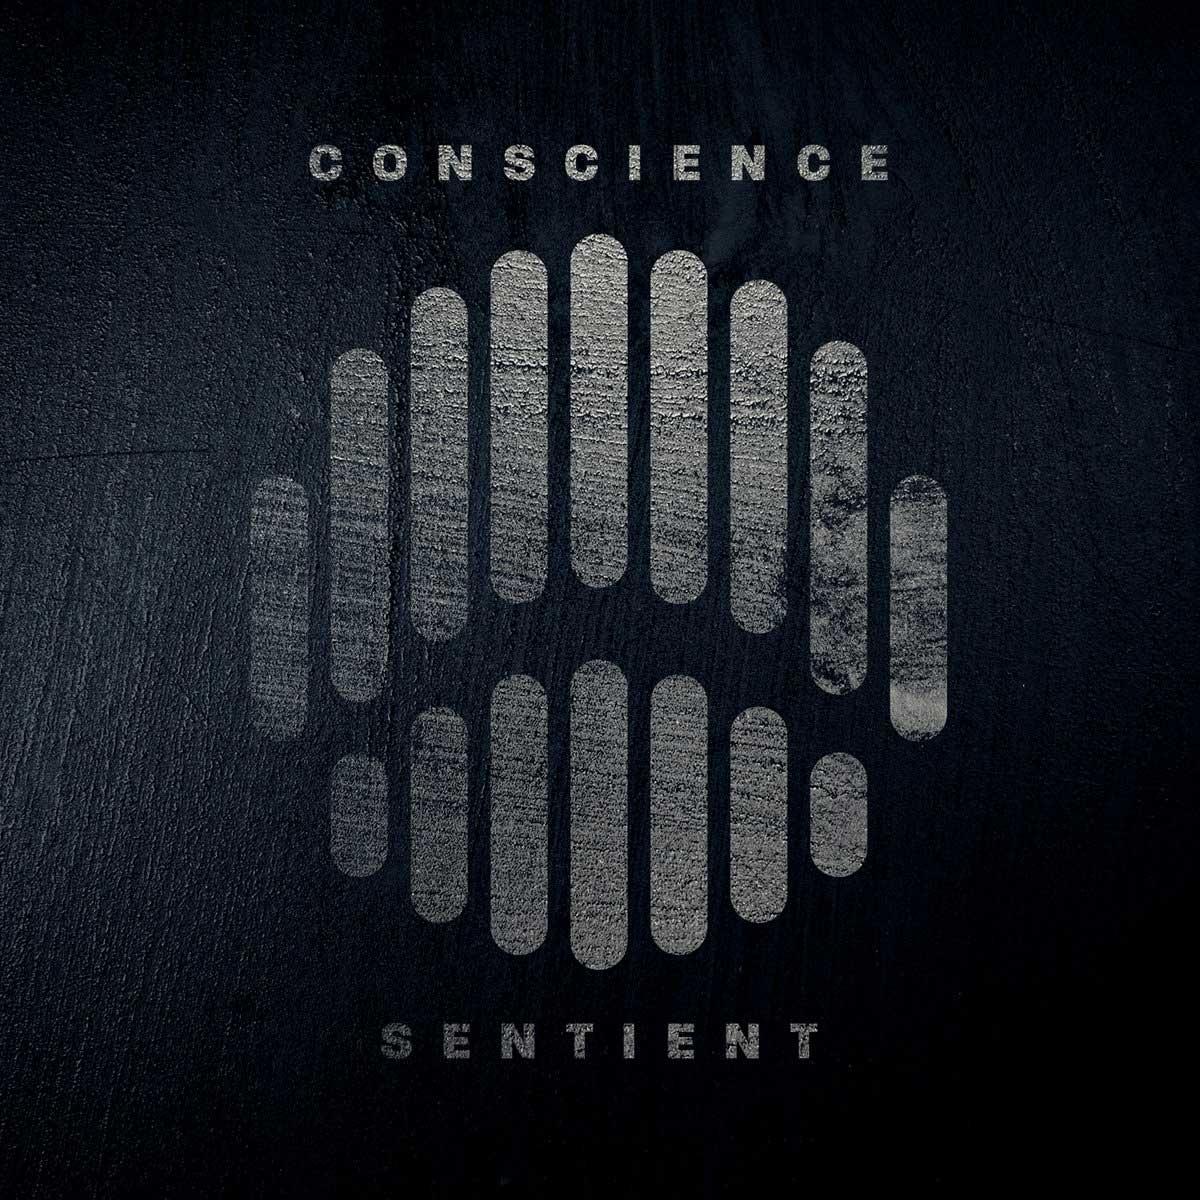 Conscience - Sentient - Conscience - Sentient